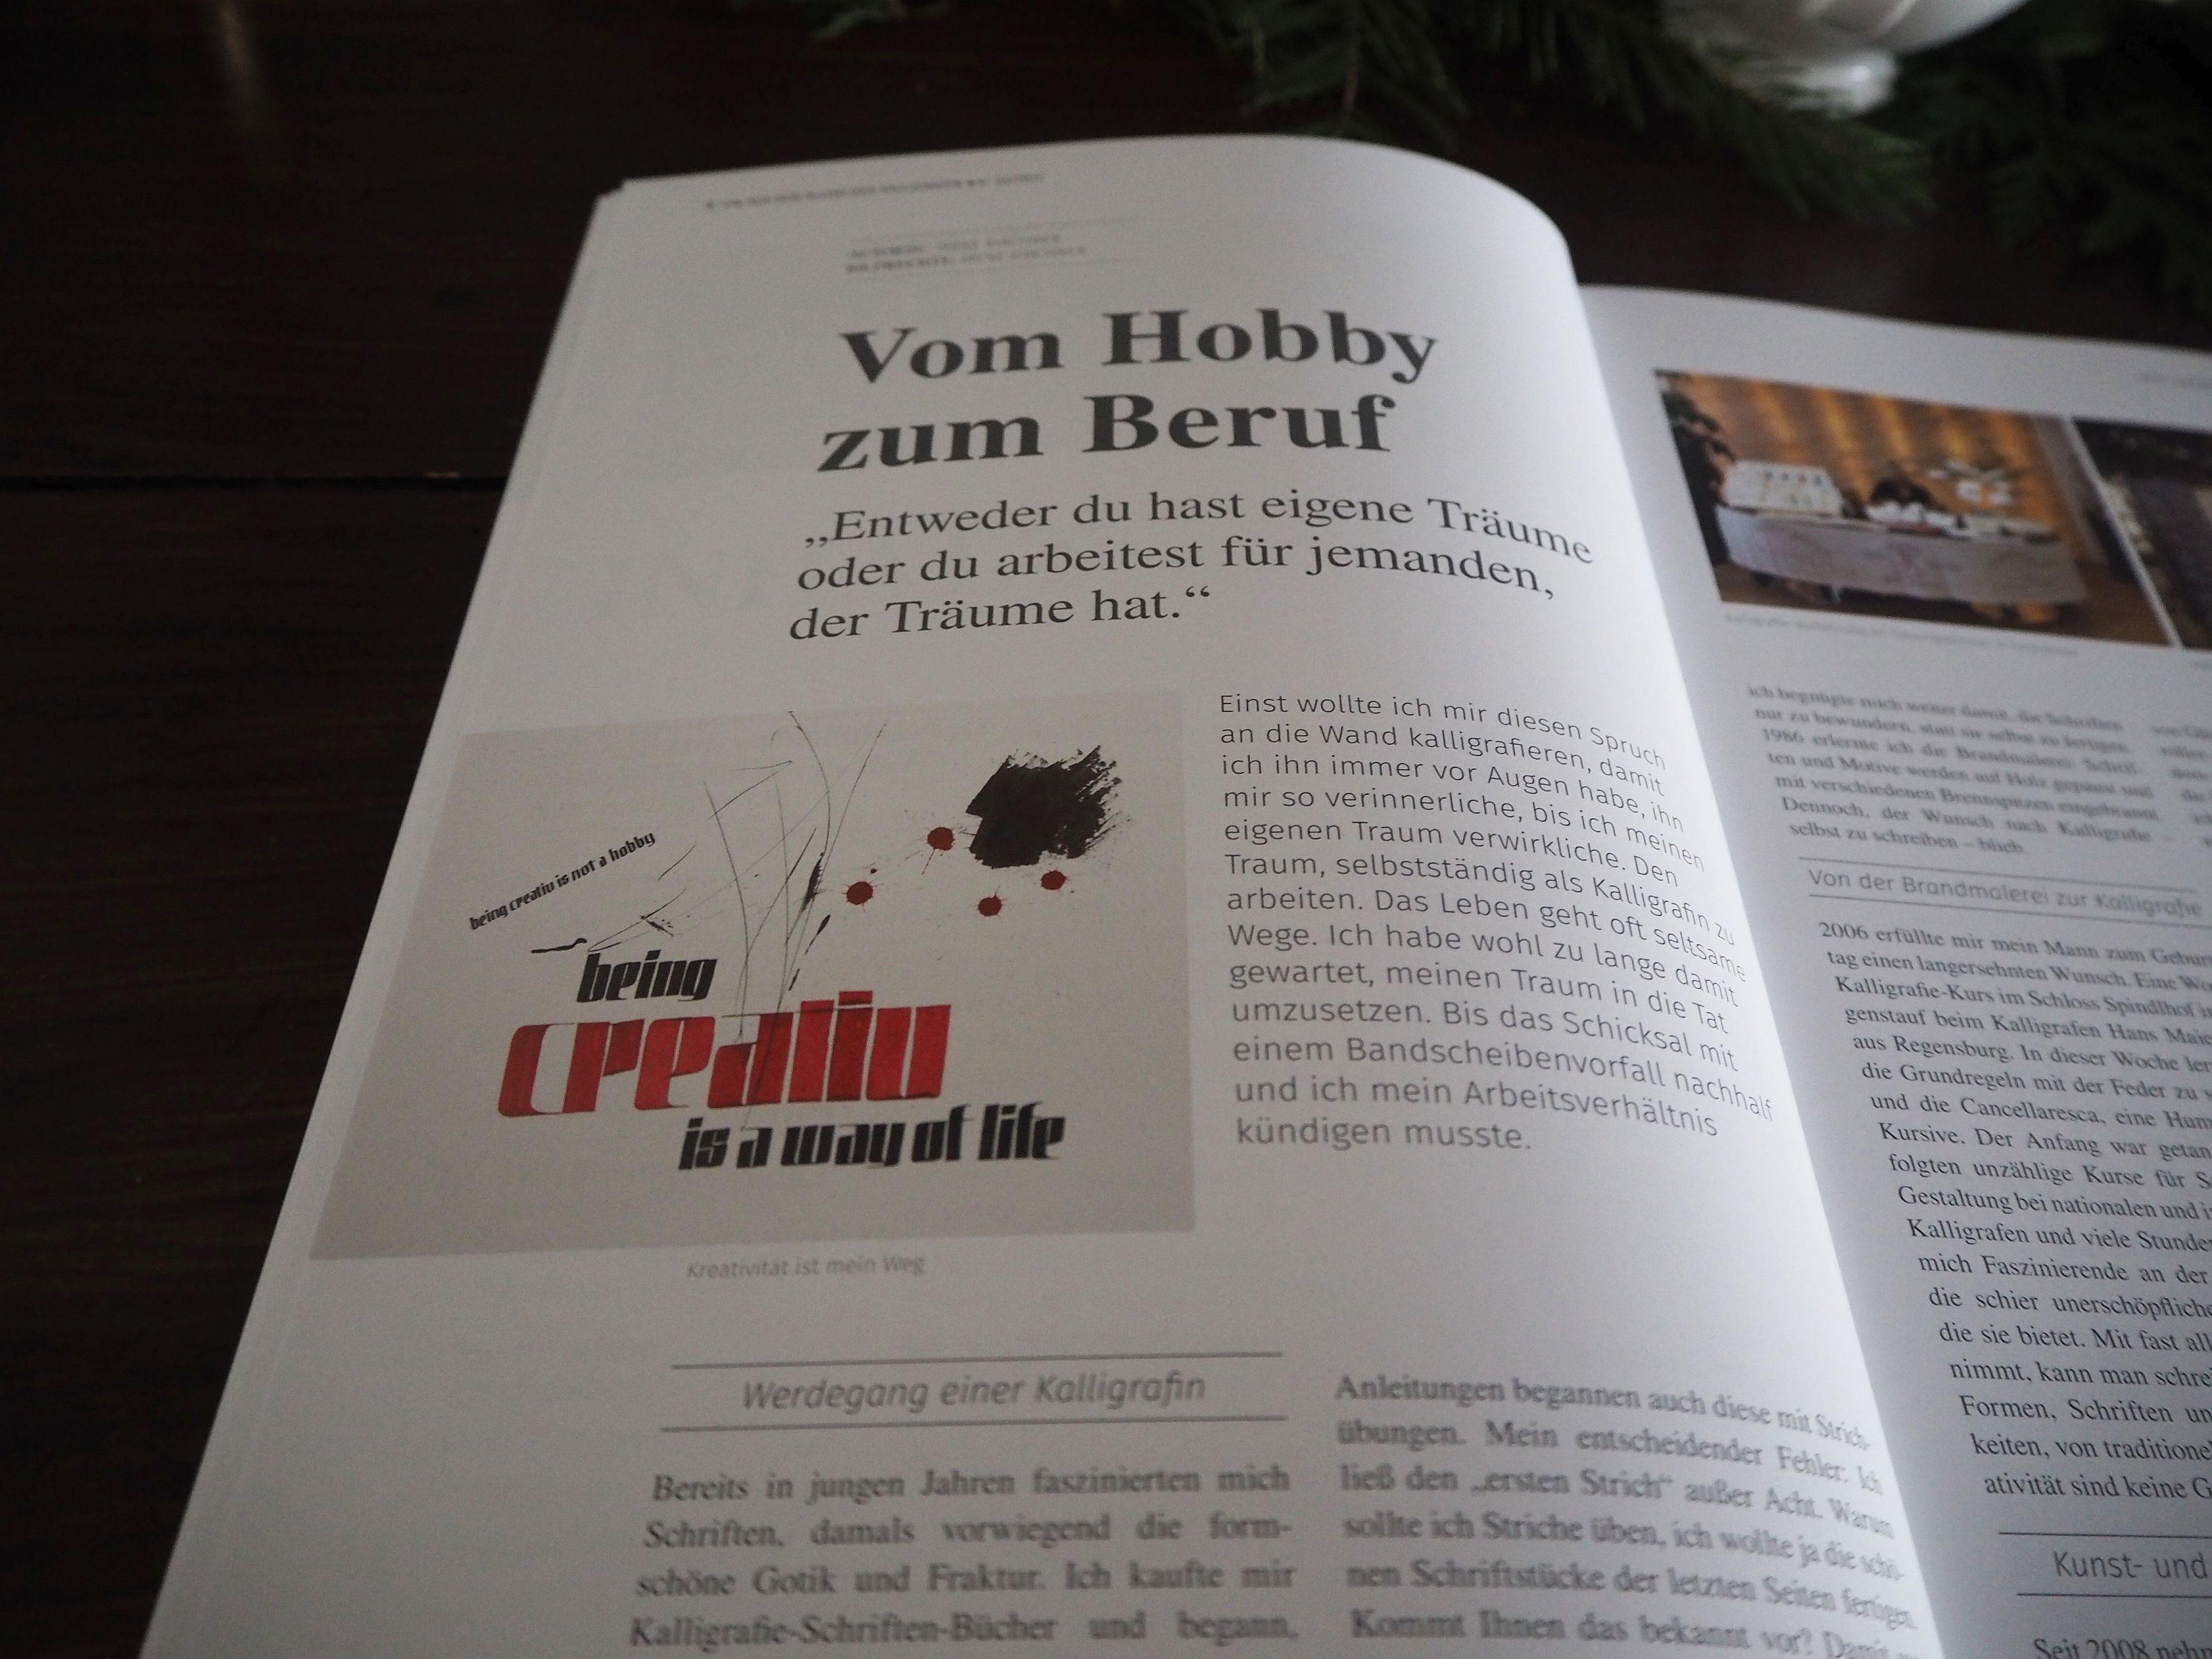 2017-12-skoen-och-kreativ-sonntagslektuere-zeitschrift-kalligrafie-aktuell (5)